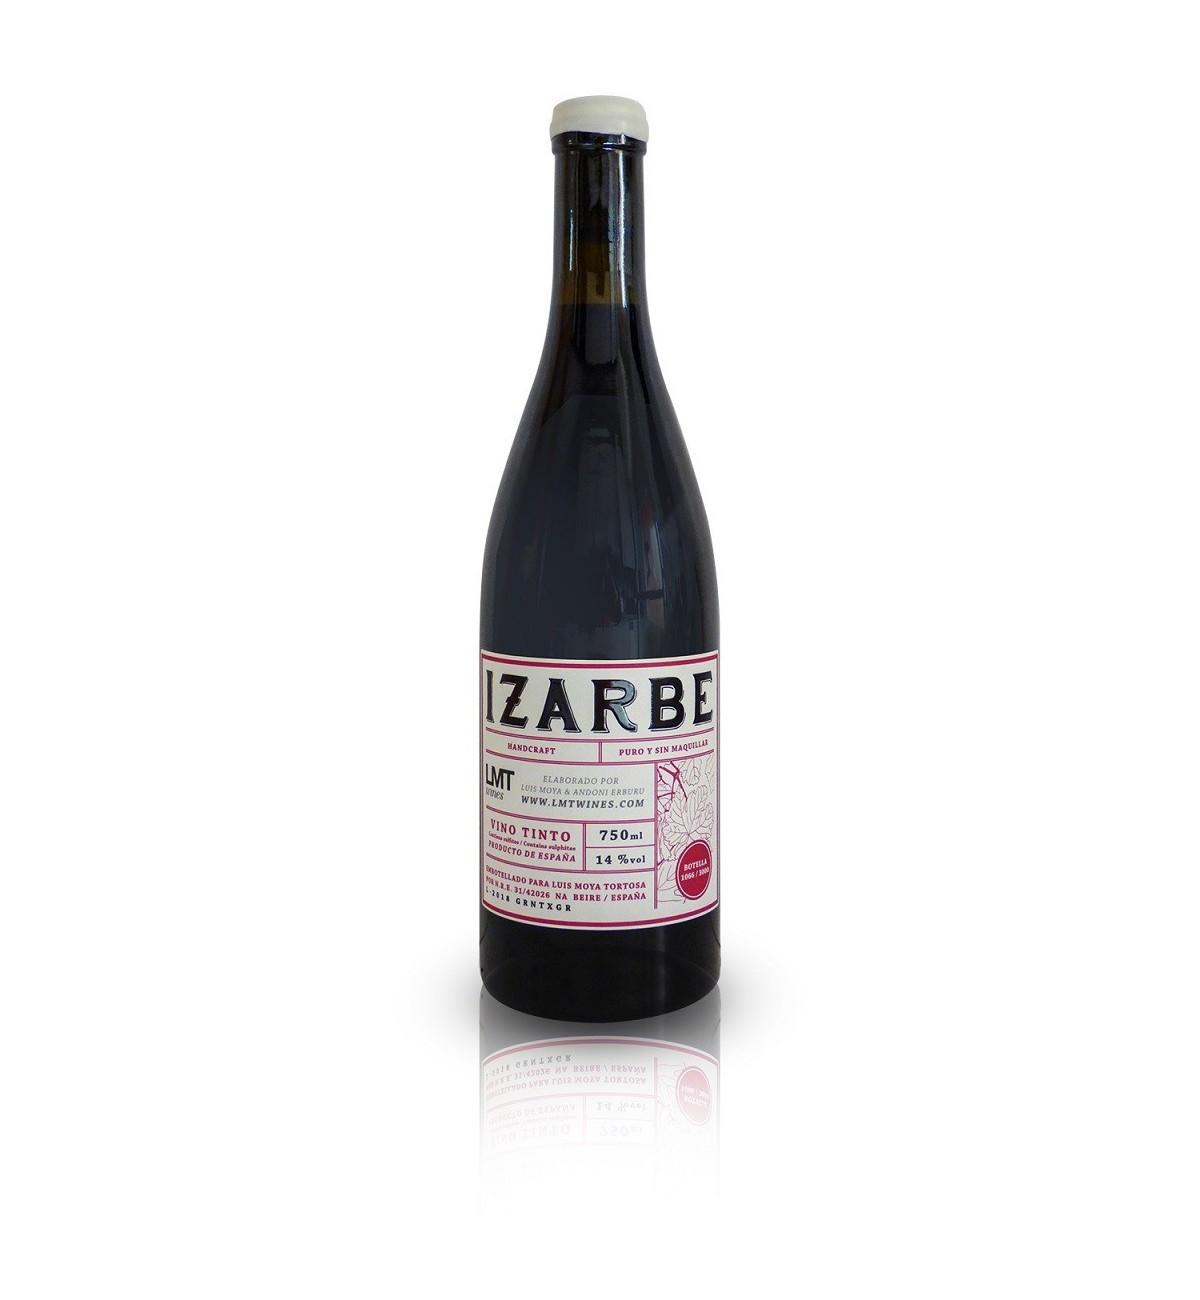 Izarbe 2018 - LMT wines - Garnatxa, Graciano, viñas viejas, Navarra